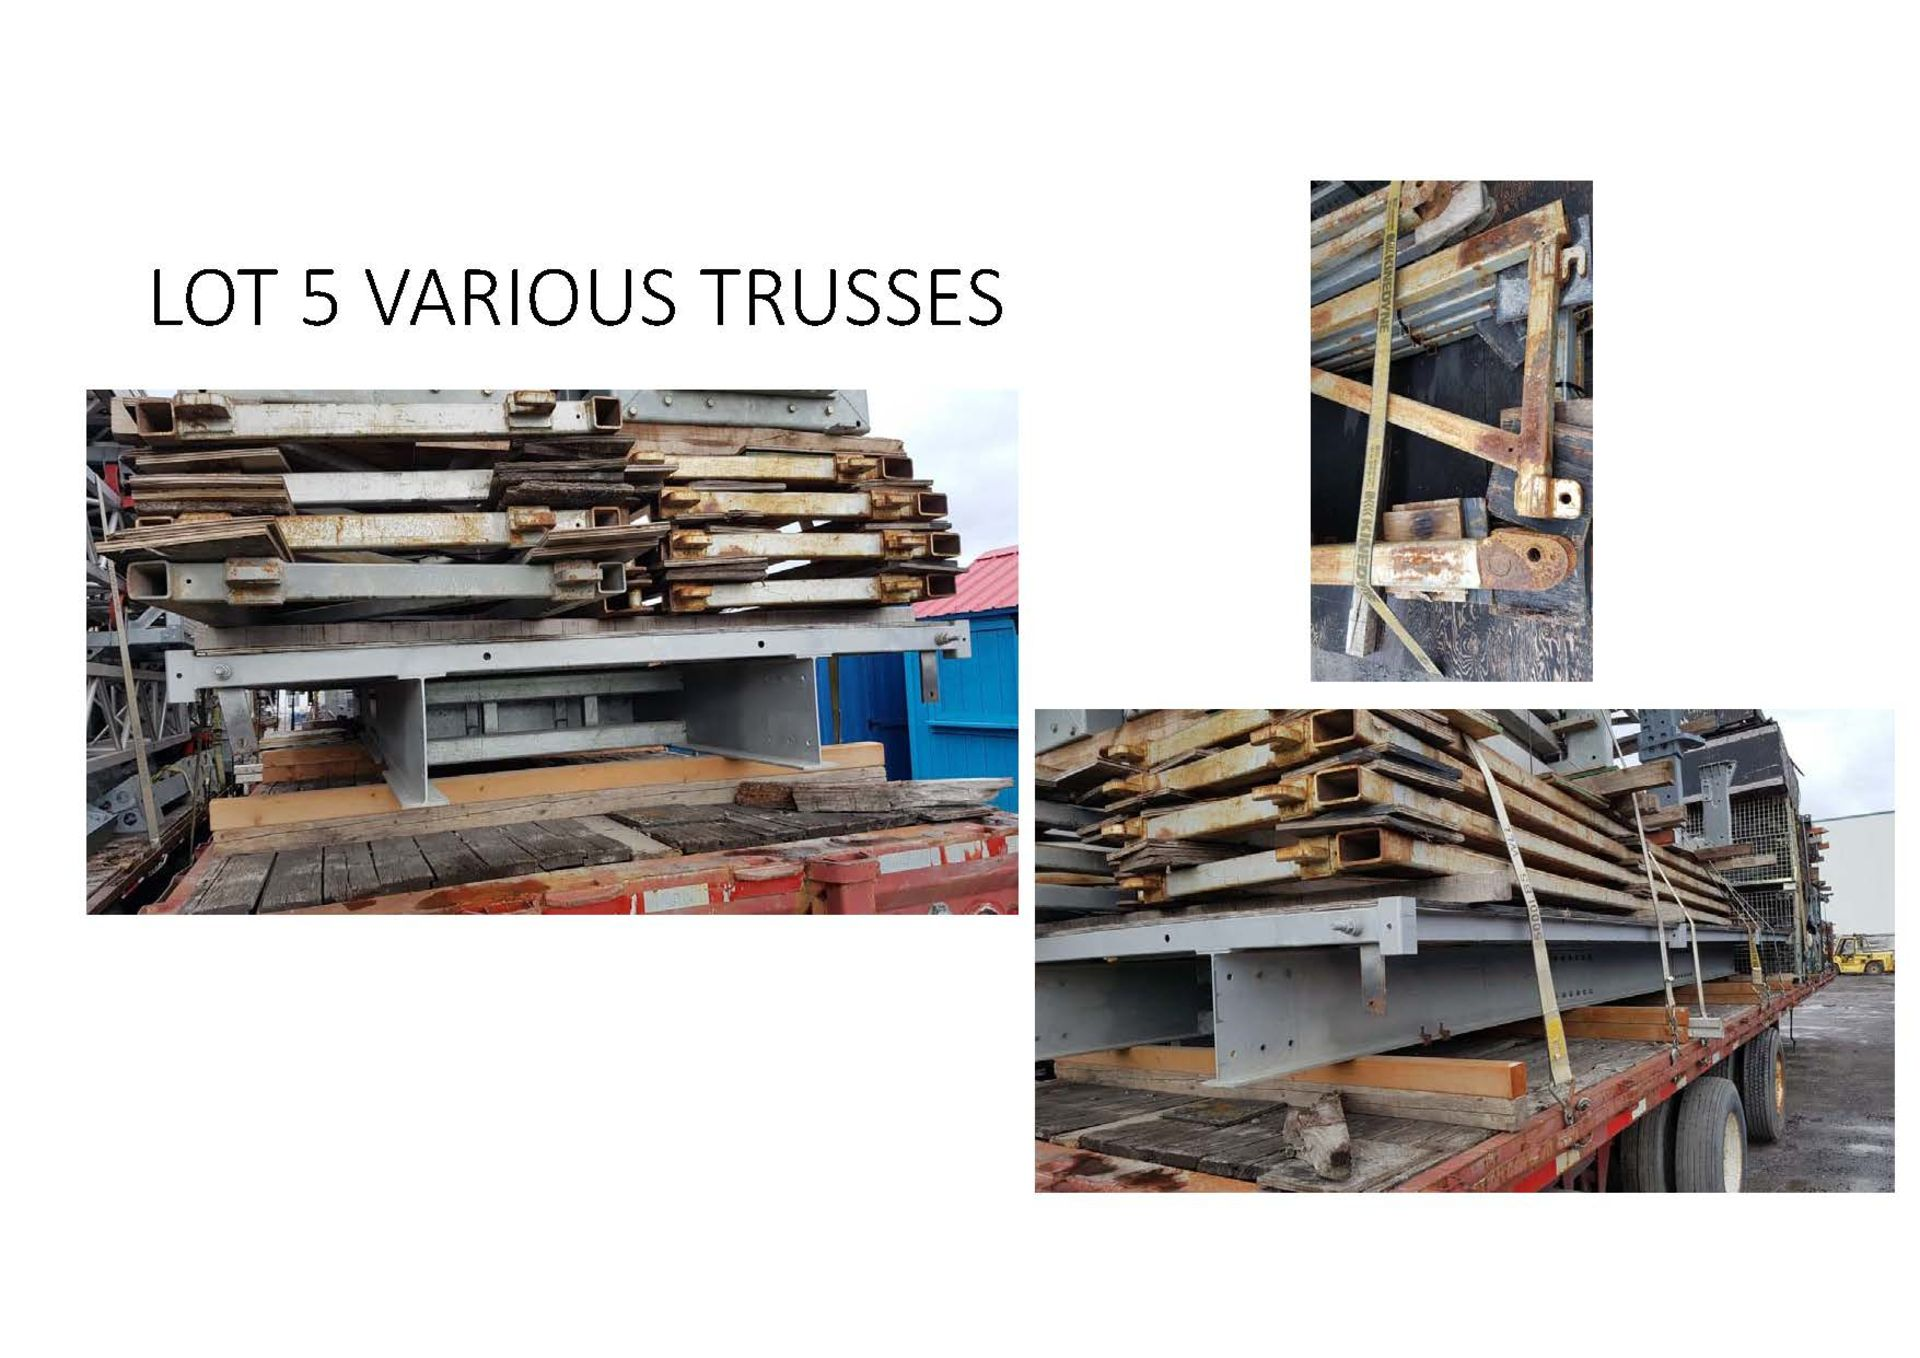 Lot 5 - Steel Truss and bridge lot